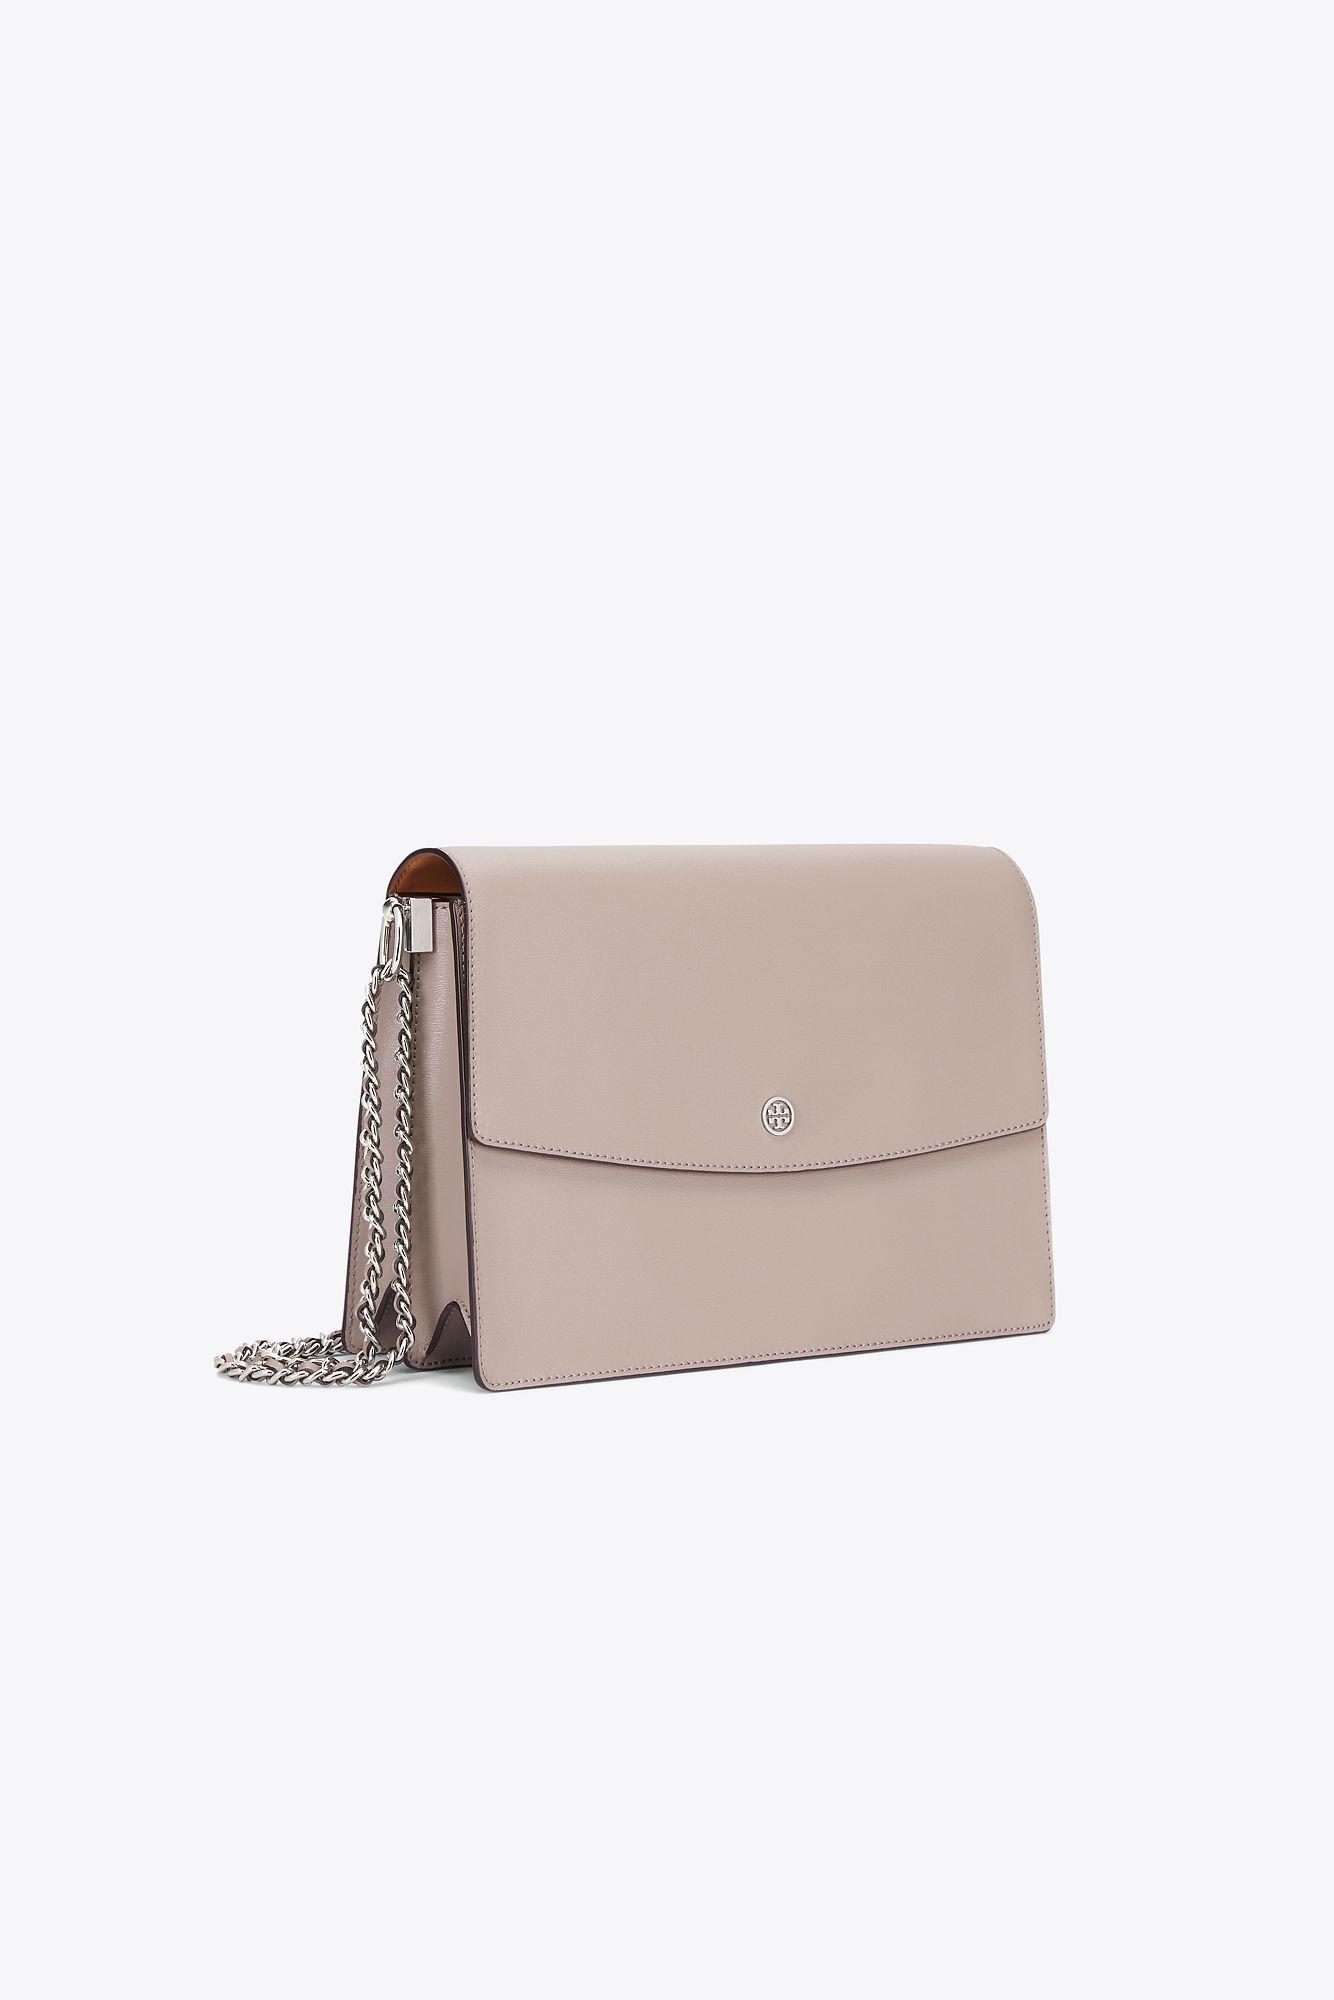 56d71abe6361 Lyst - Tory Burch Parker Convertible Large Shoulder Bag